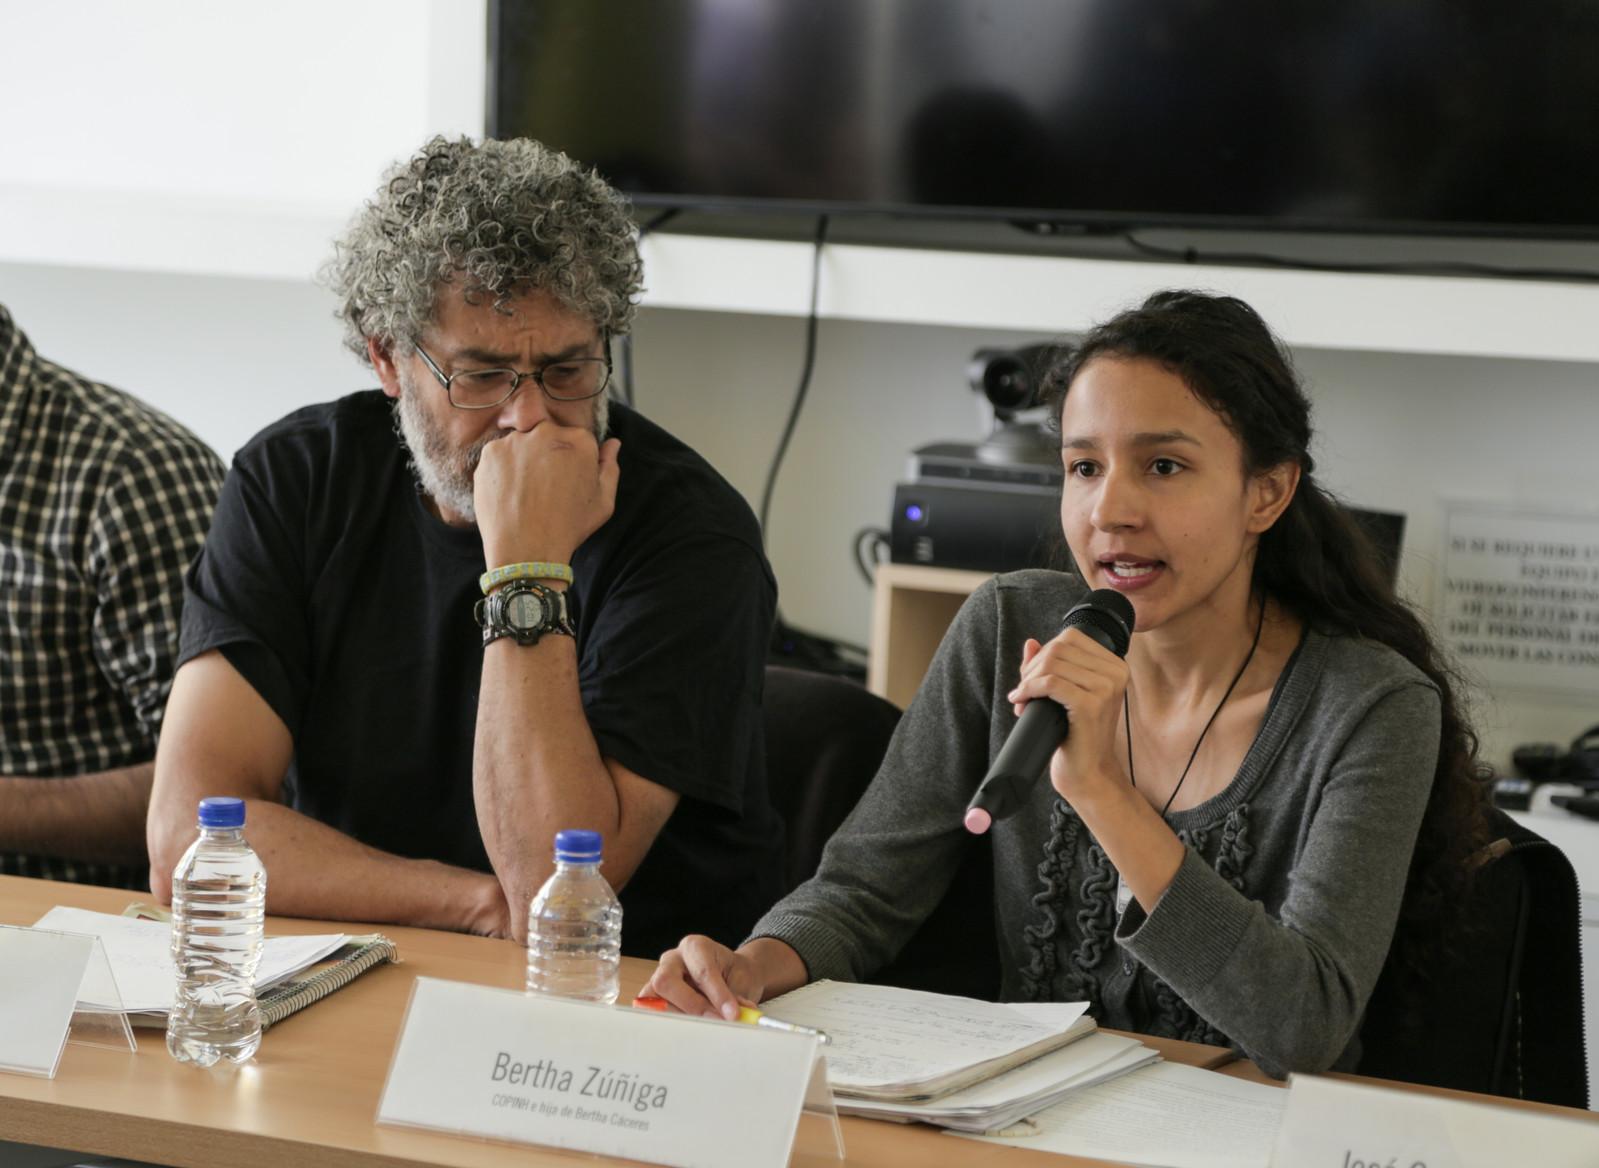 Honduras: Stop the attacks on human rights defenders